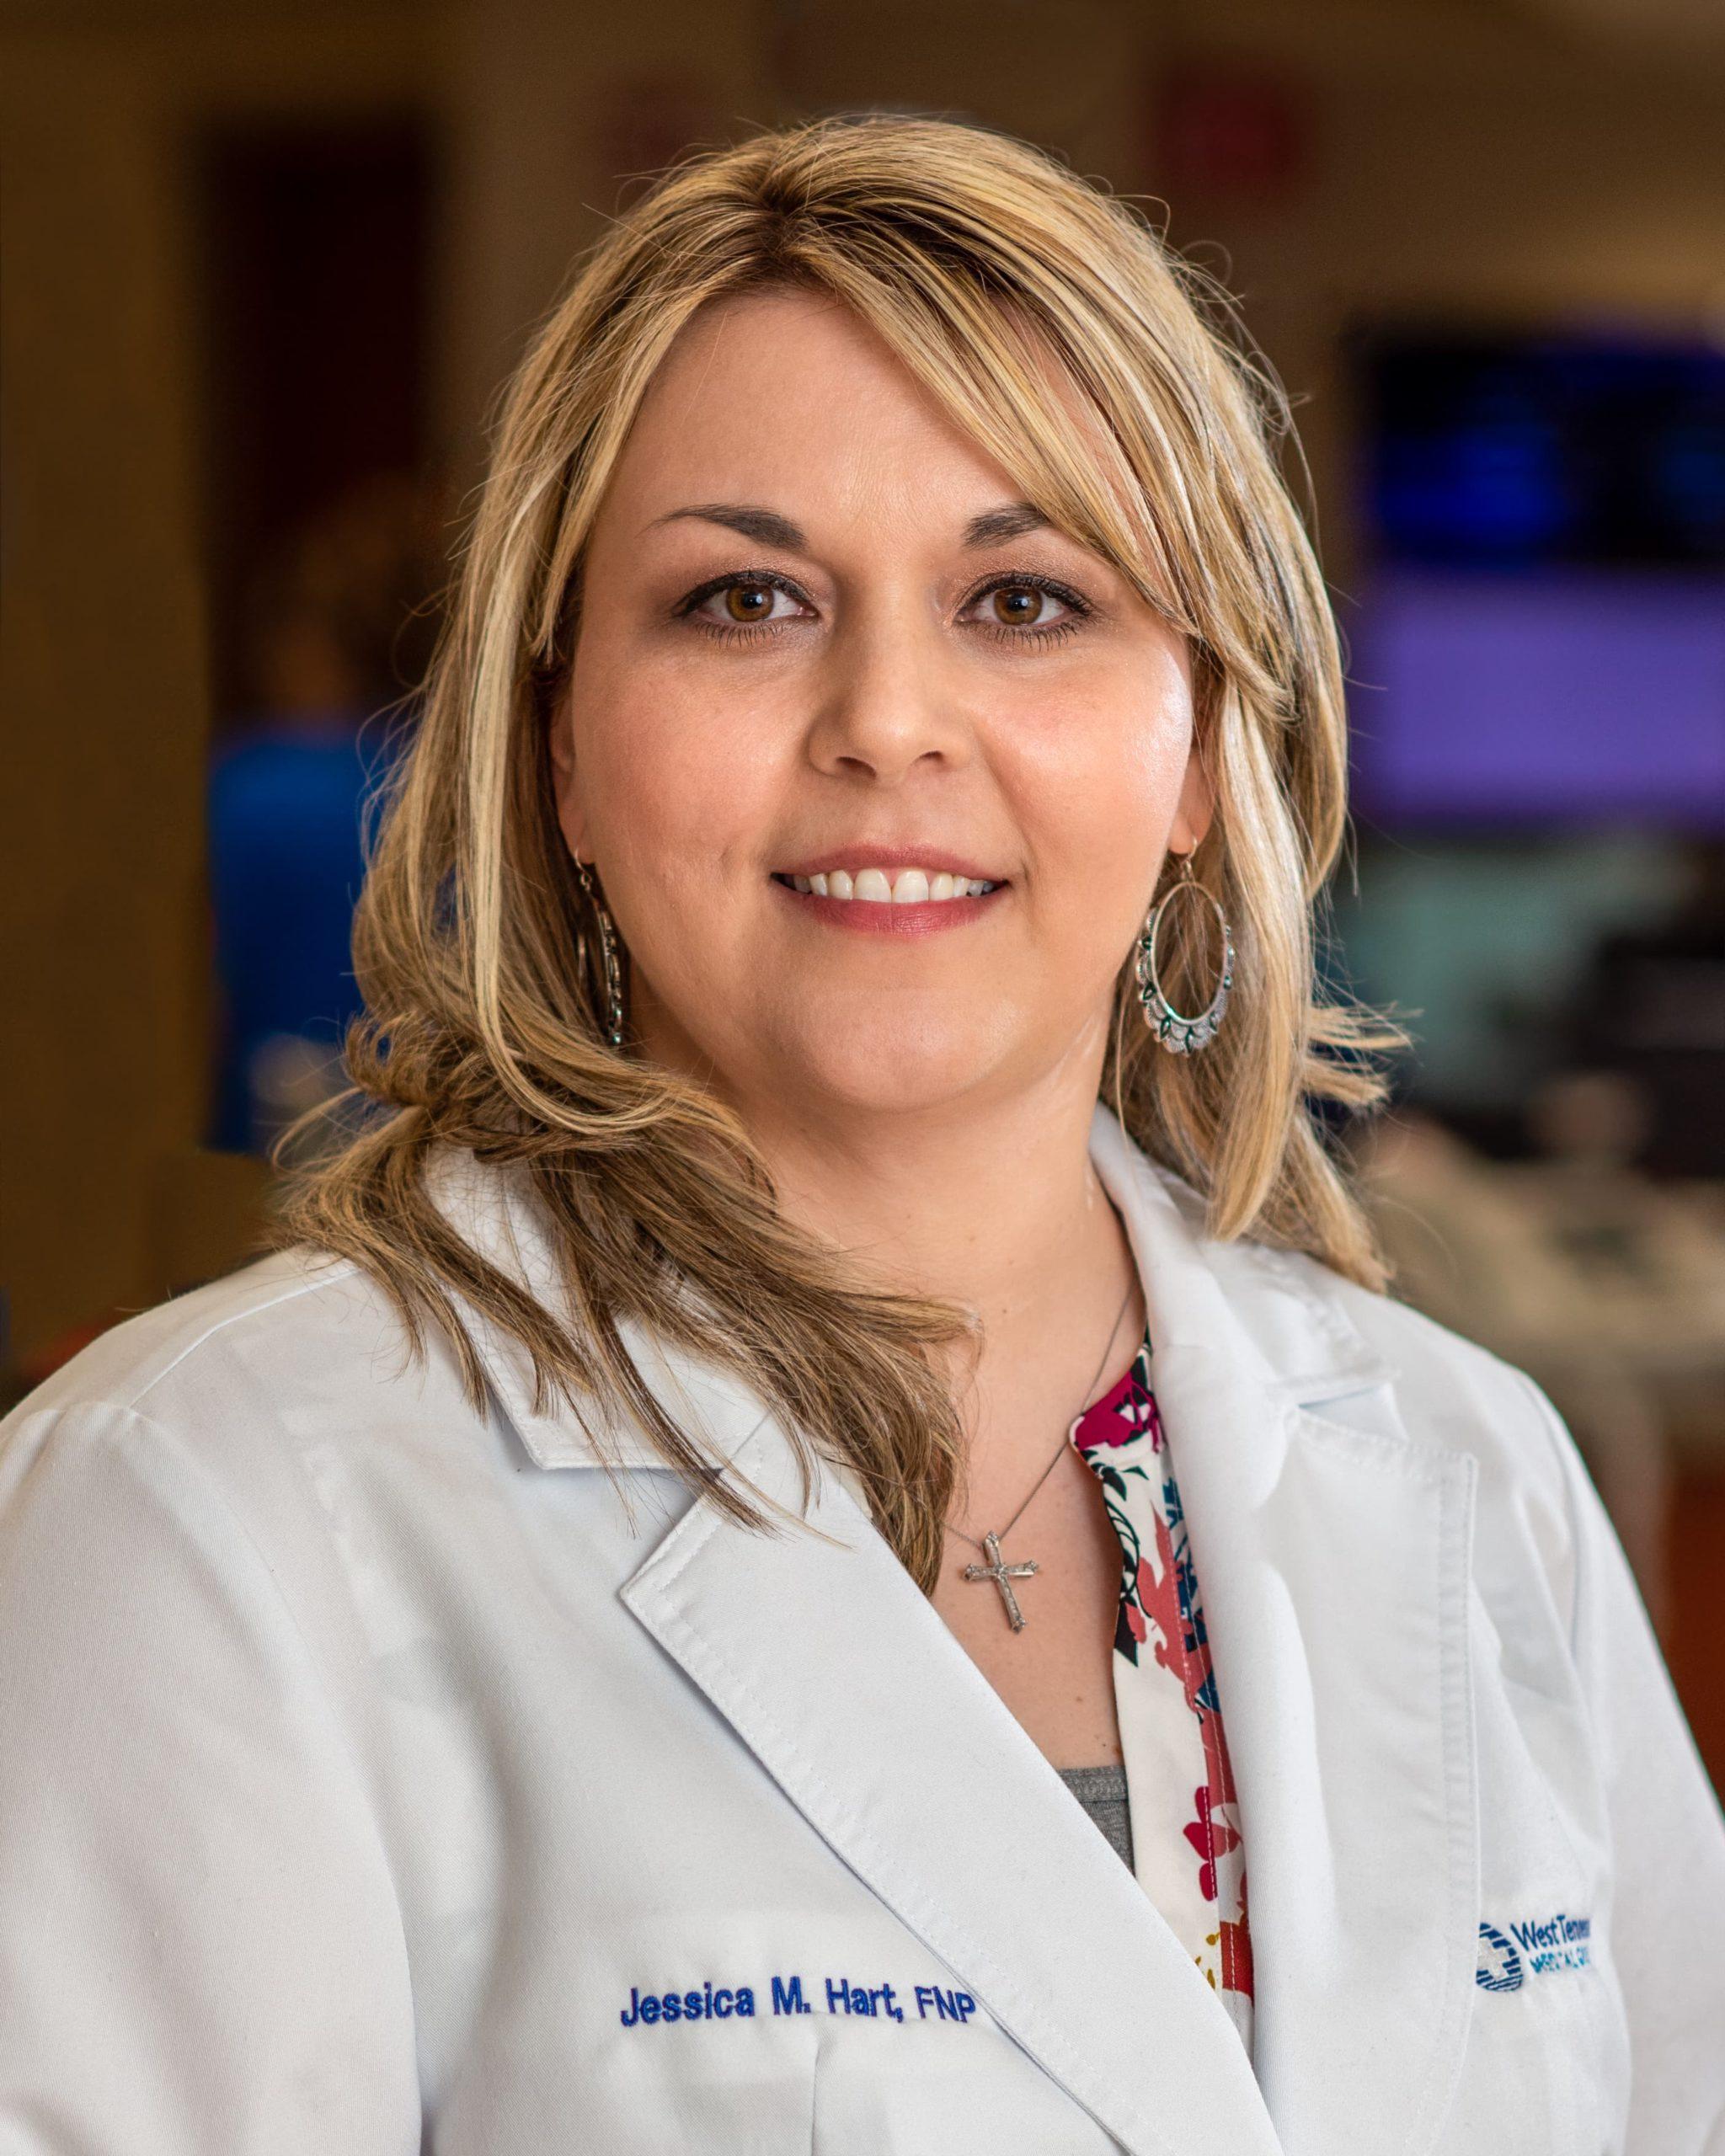 Jessica Hart, FNP